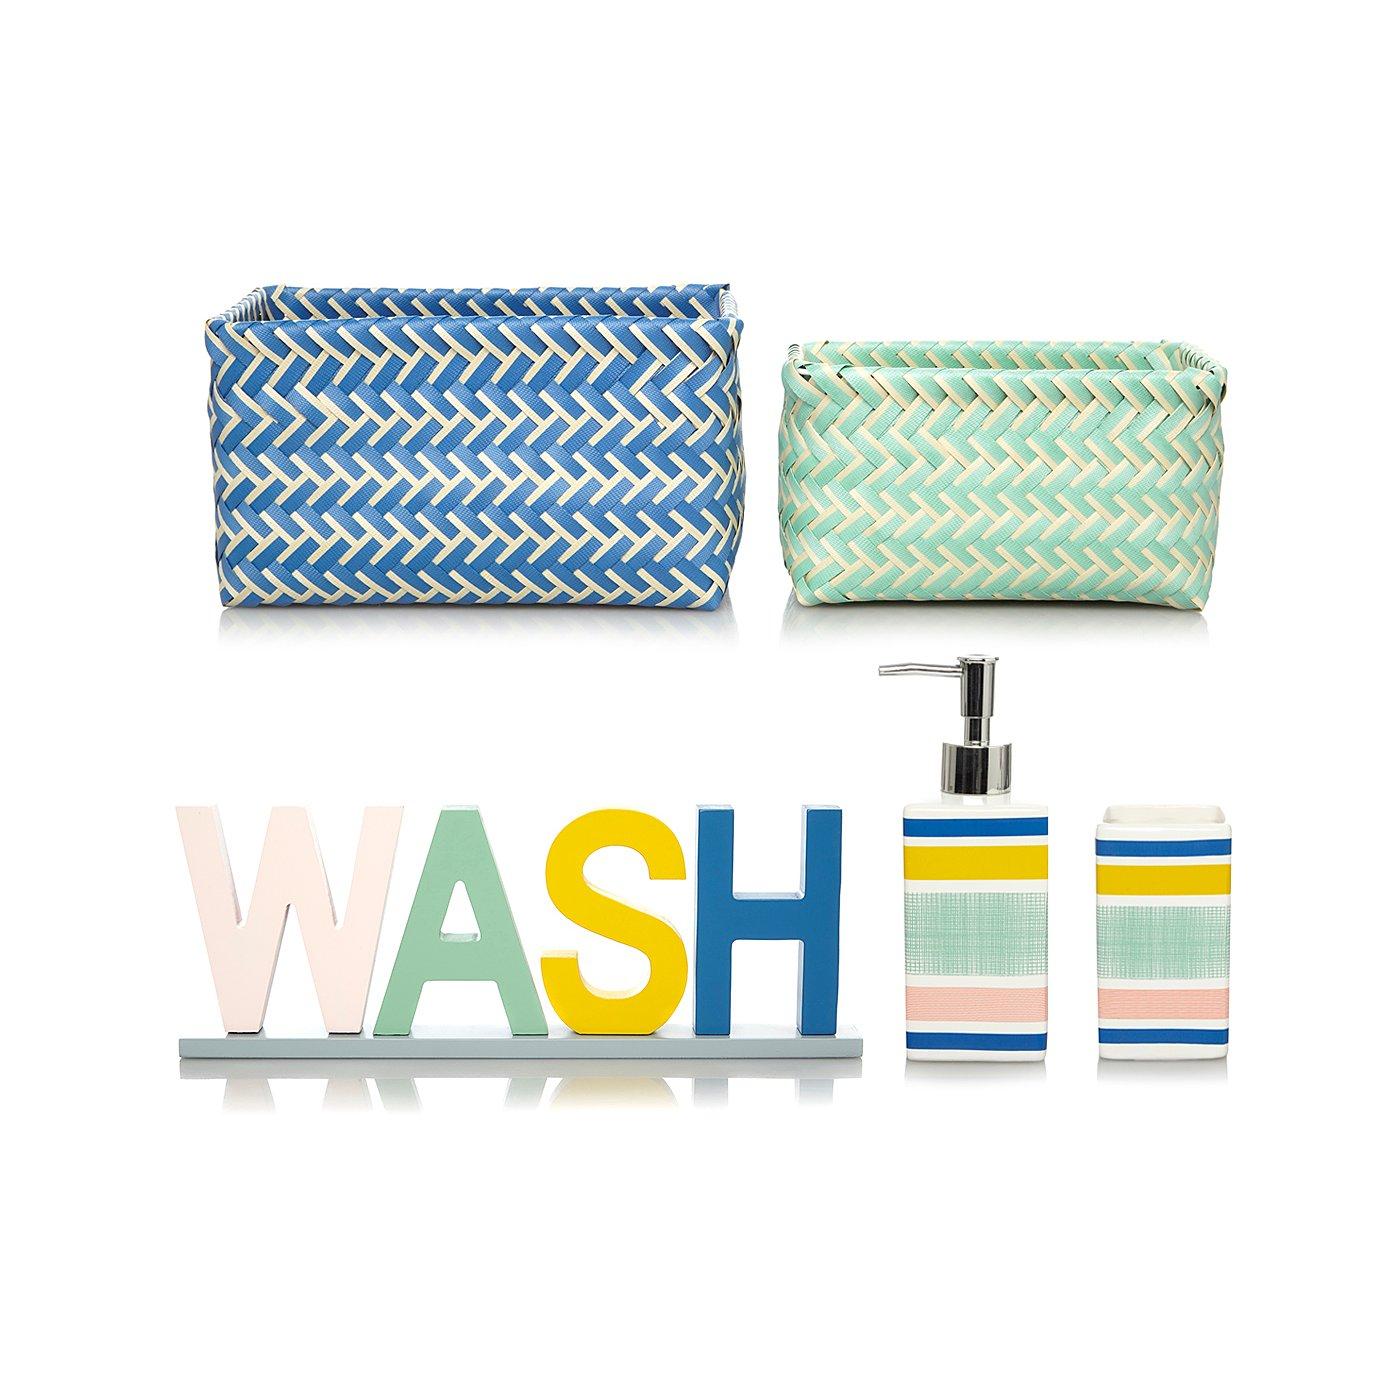 Car bathroom accessories - Modern Organic Stripes Bathroom Accessories Range